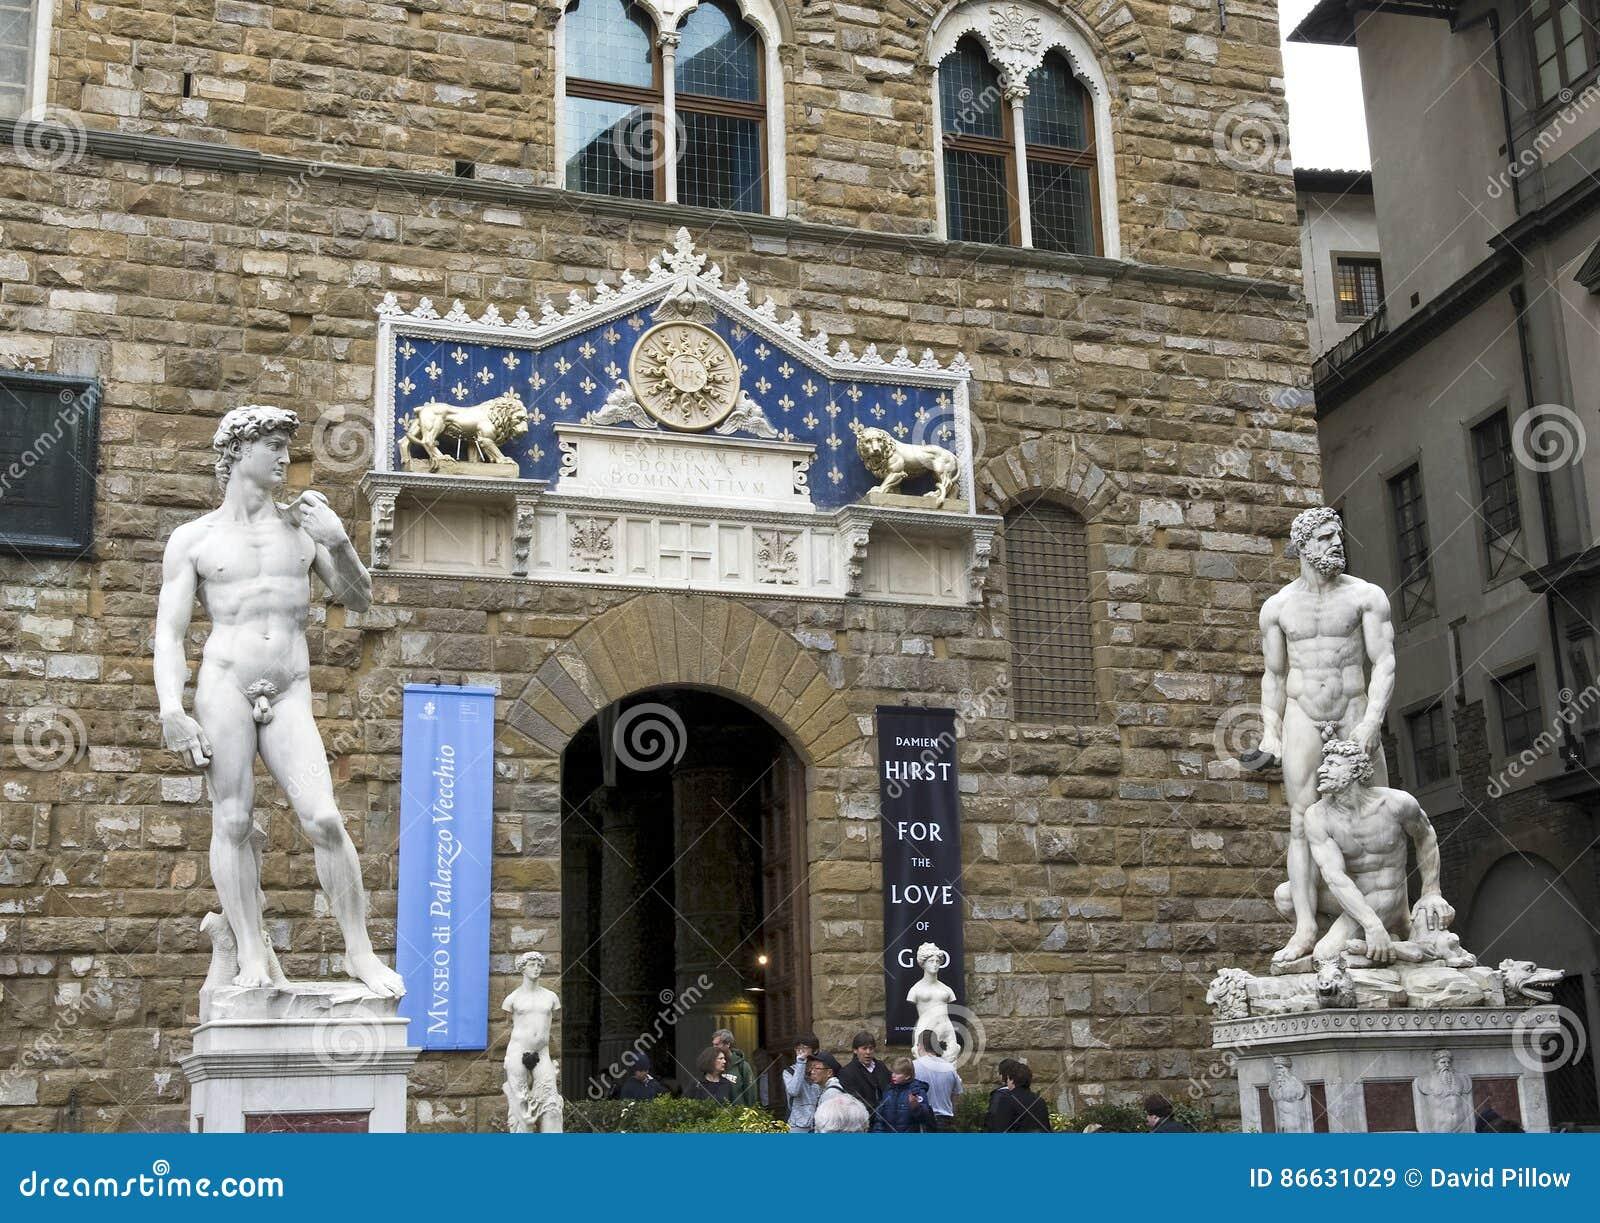 palazzo vecchio entrance - photo #7